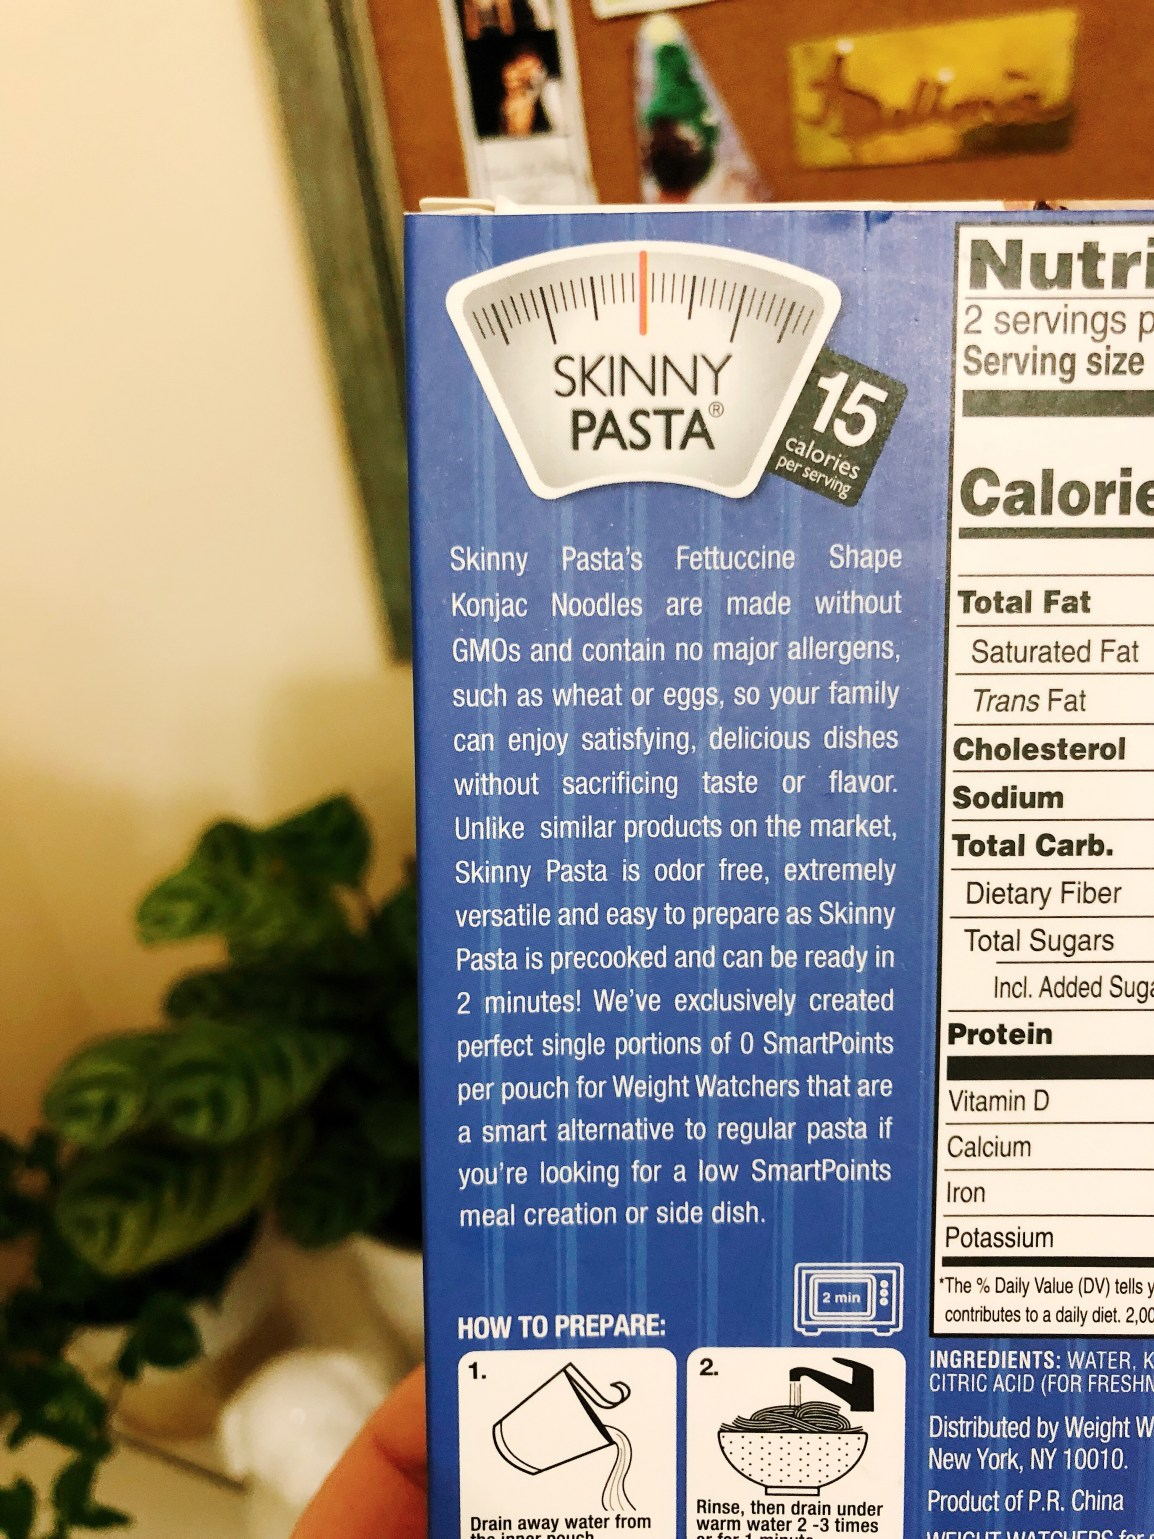 Weight Watchers Skinny Pasta back